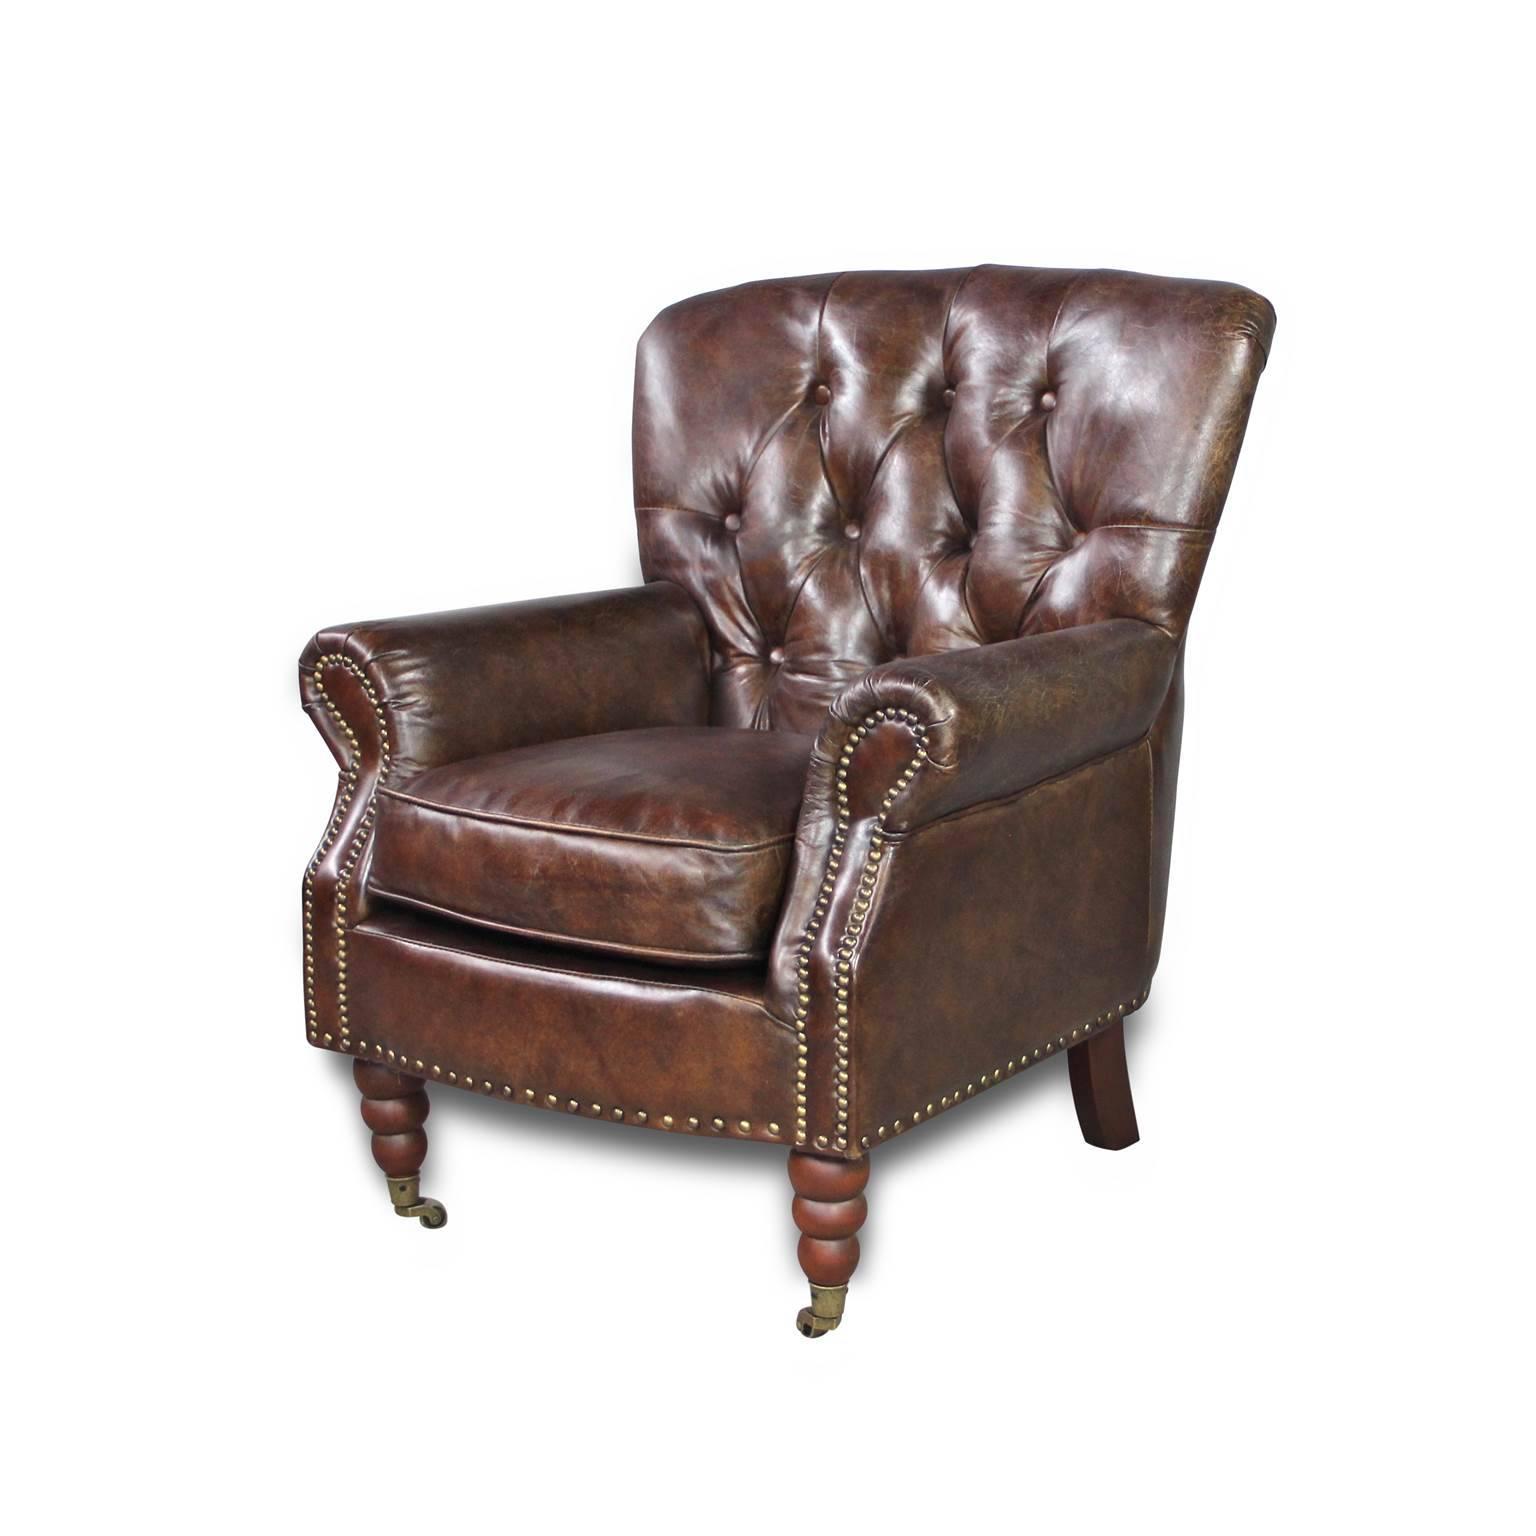 Www anibis ch meubles